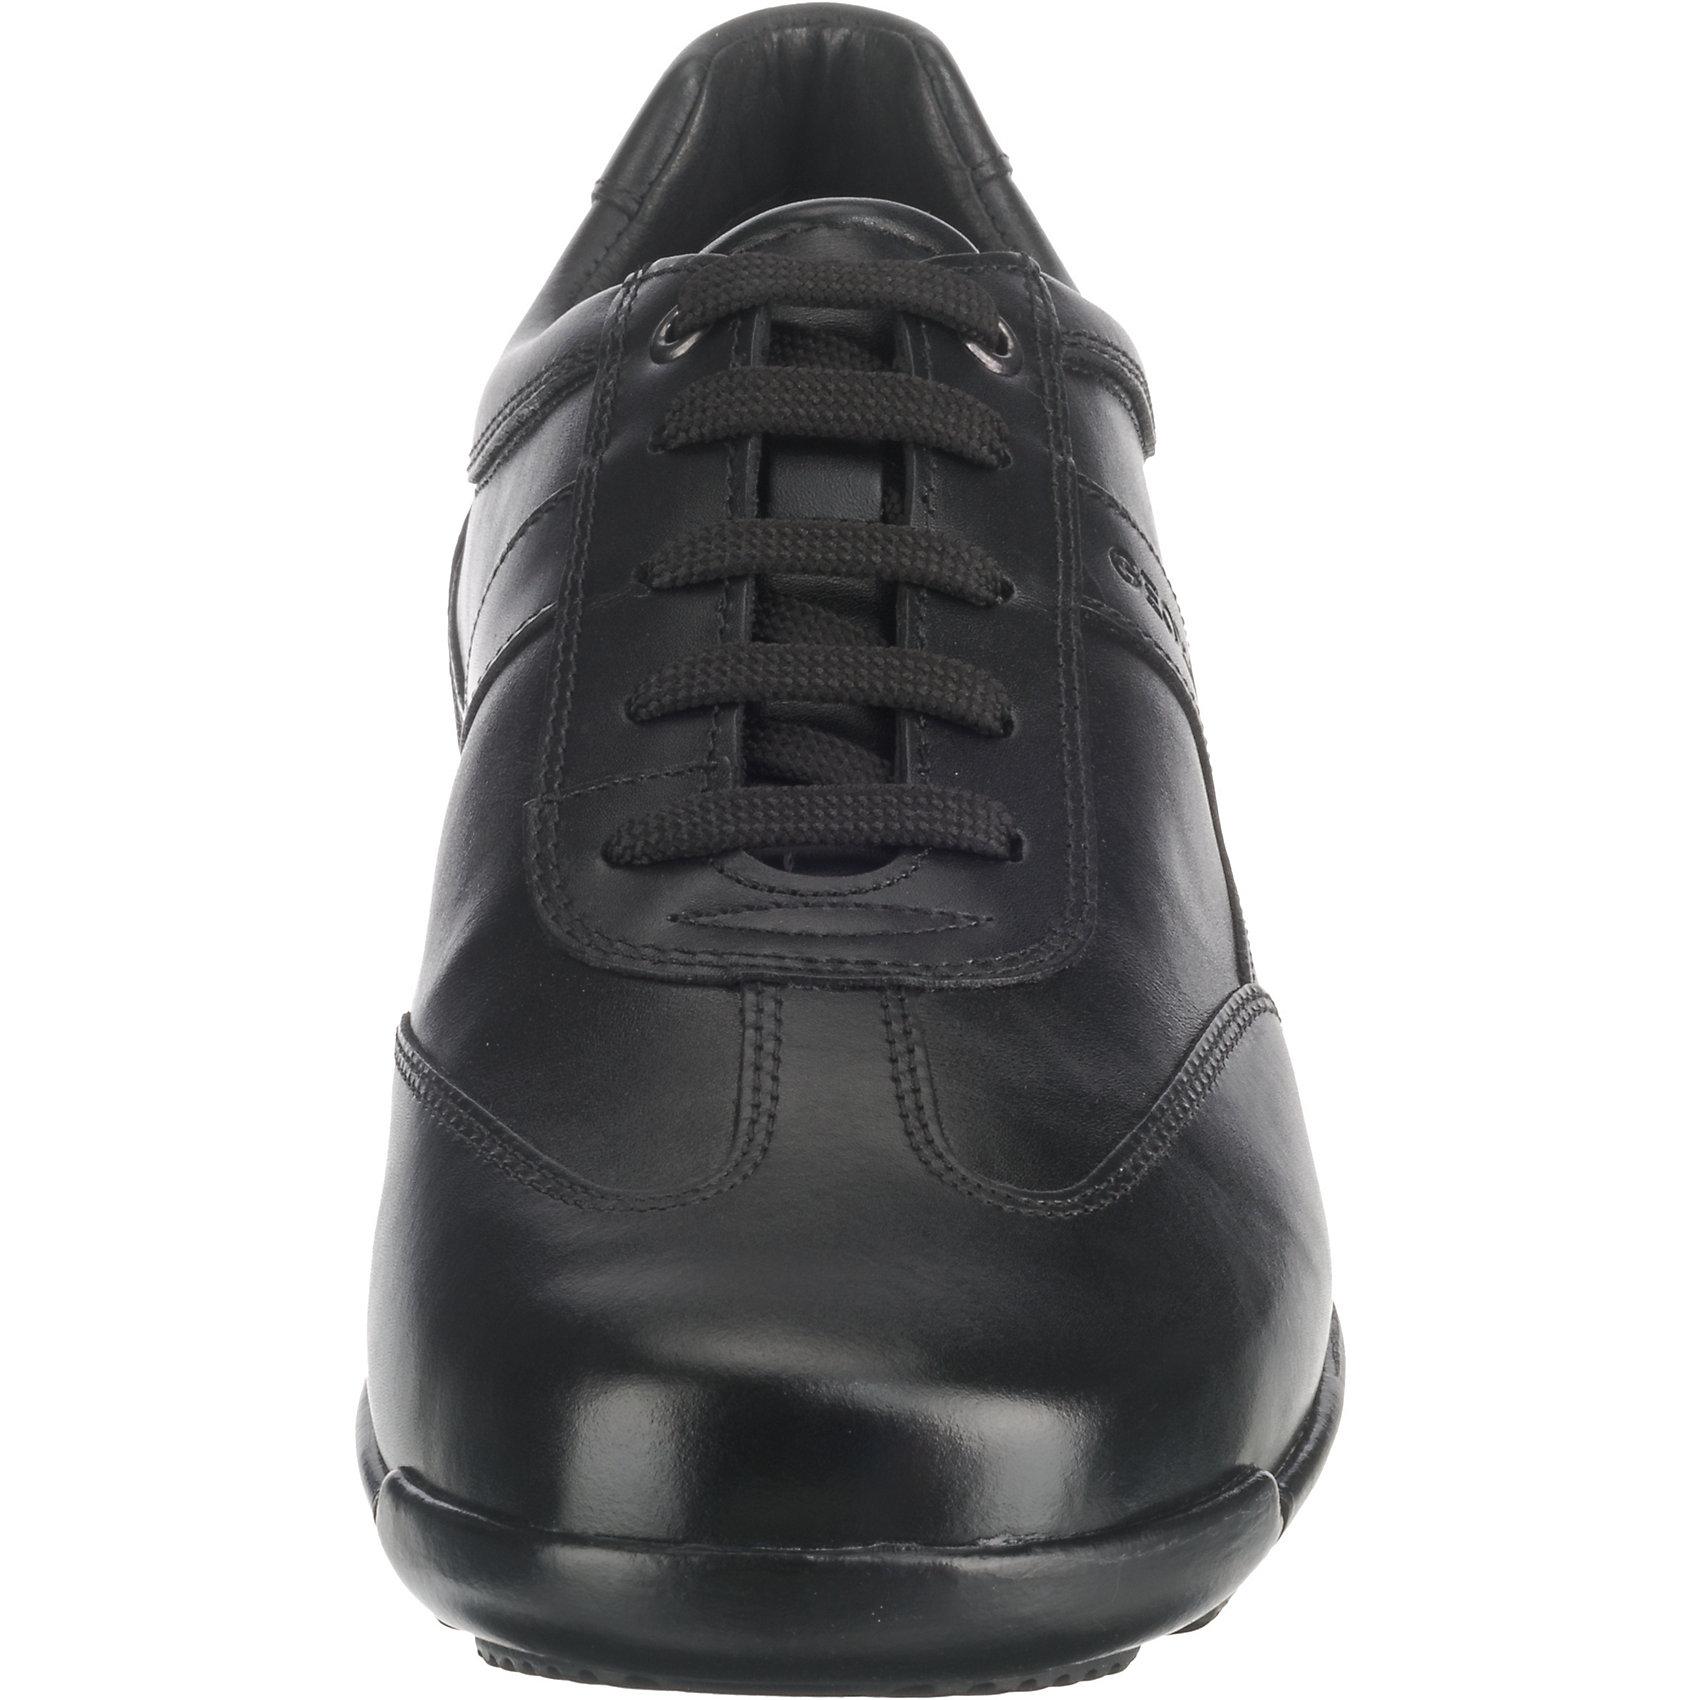 promo code d0367 697a3 ... Nike Air Max 98 Wolf Wolf Wolf Grey Total Crimson 640744 006 Men s Sz 9,  ...